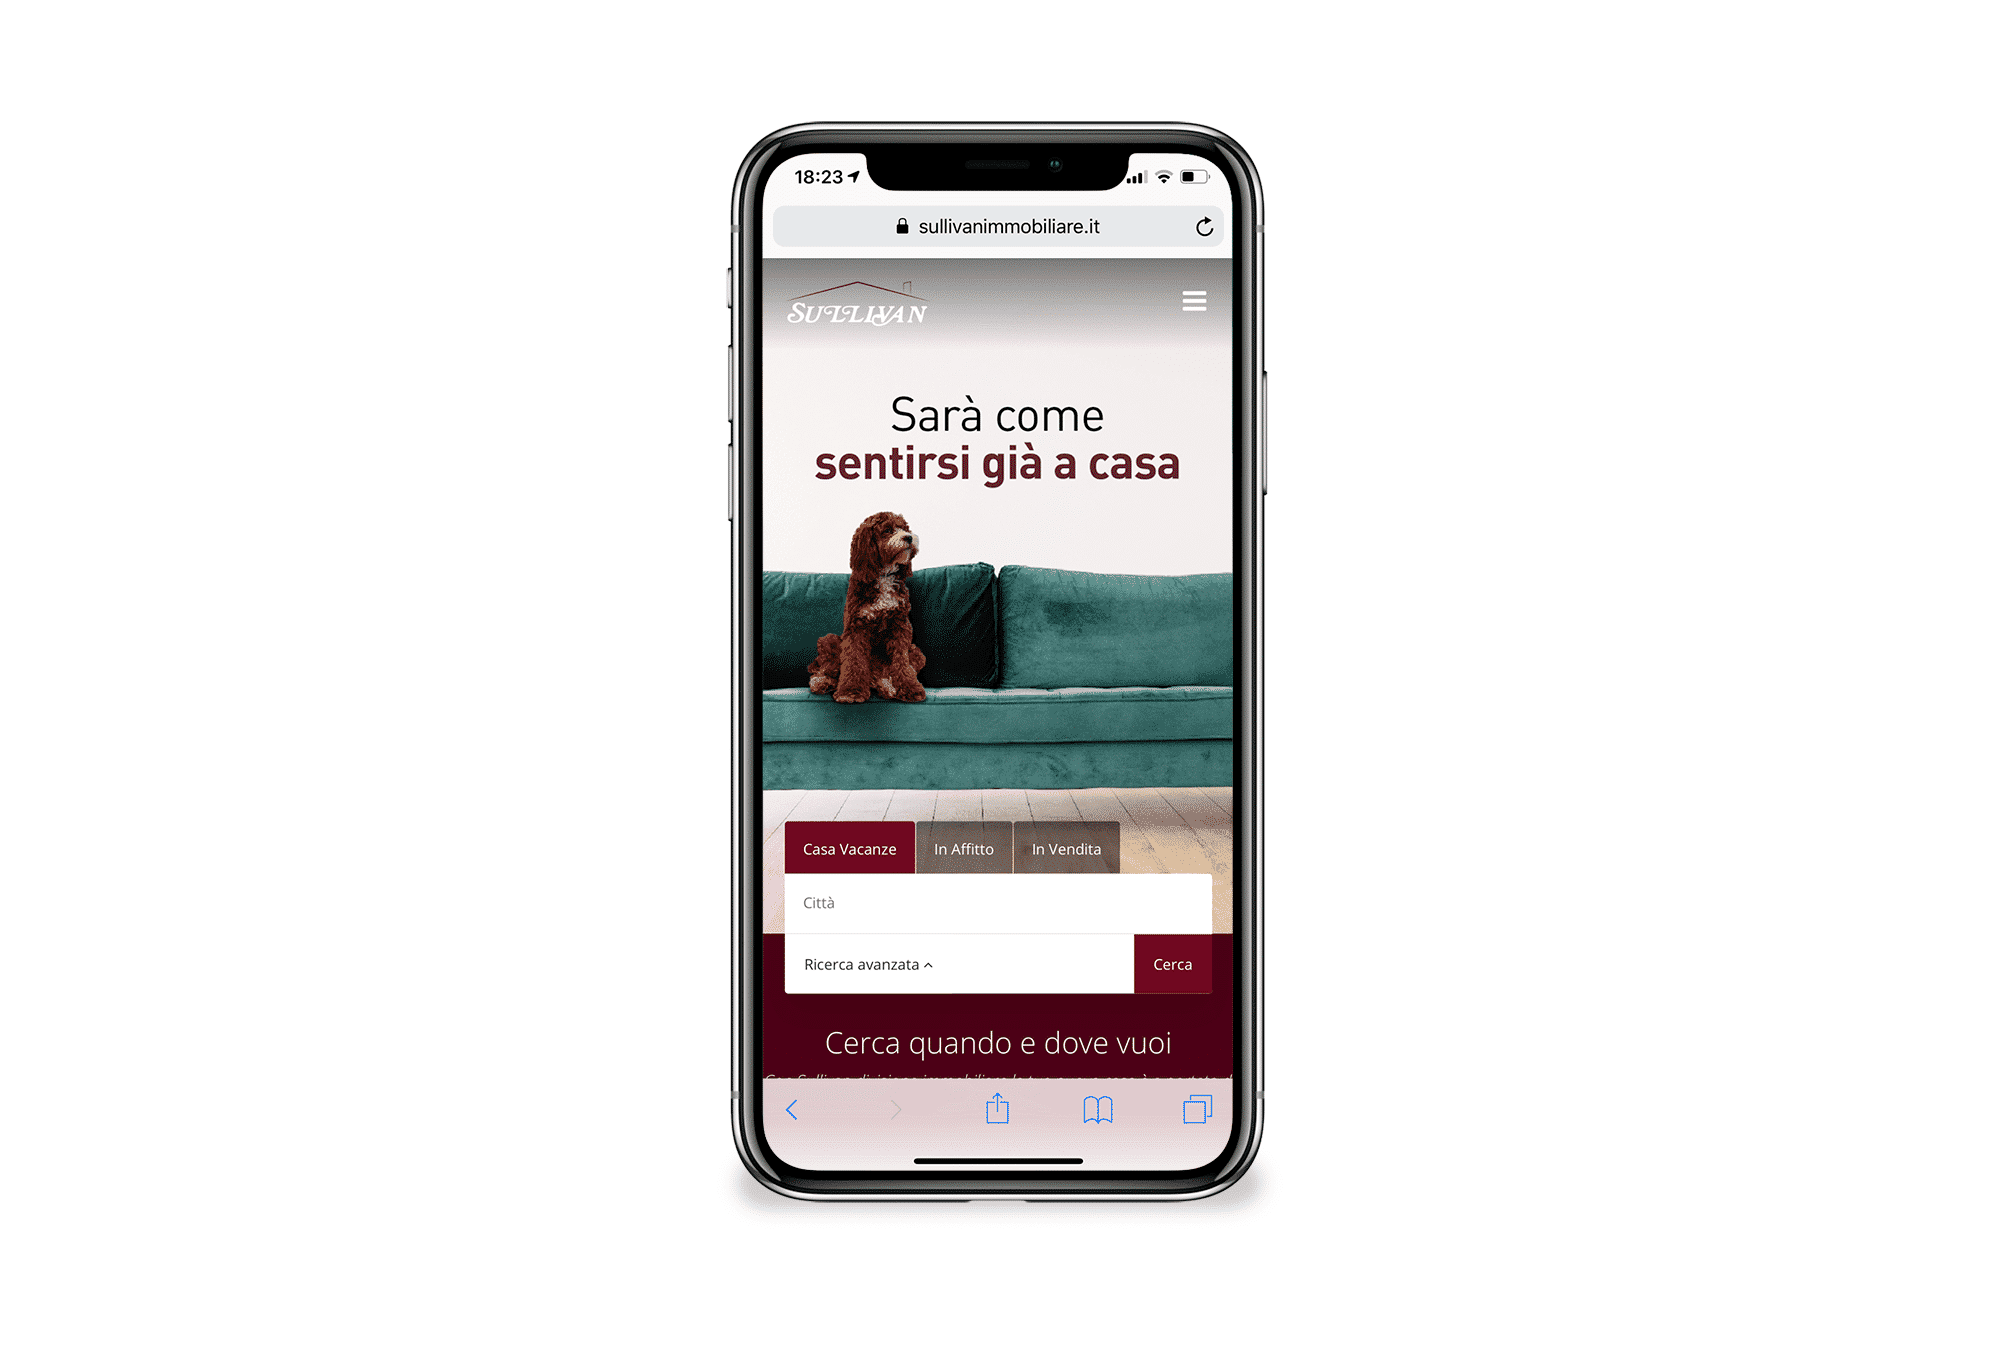 bbadv-iphone-mockup-website-sullivan-immobiliare